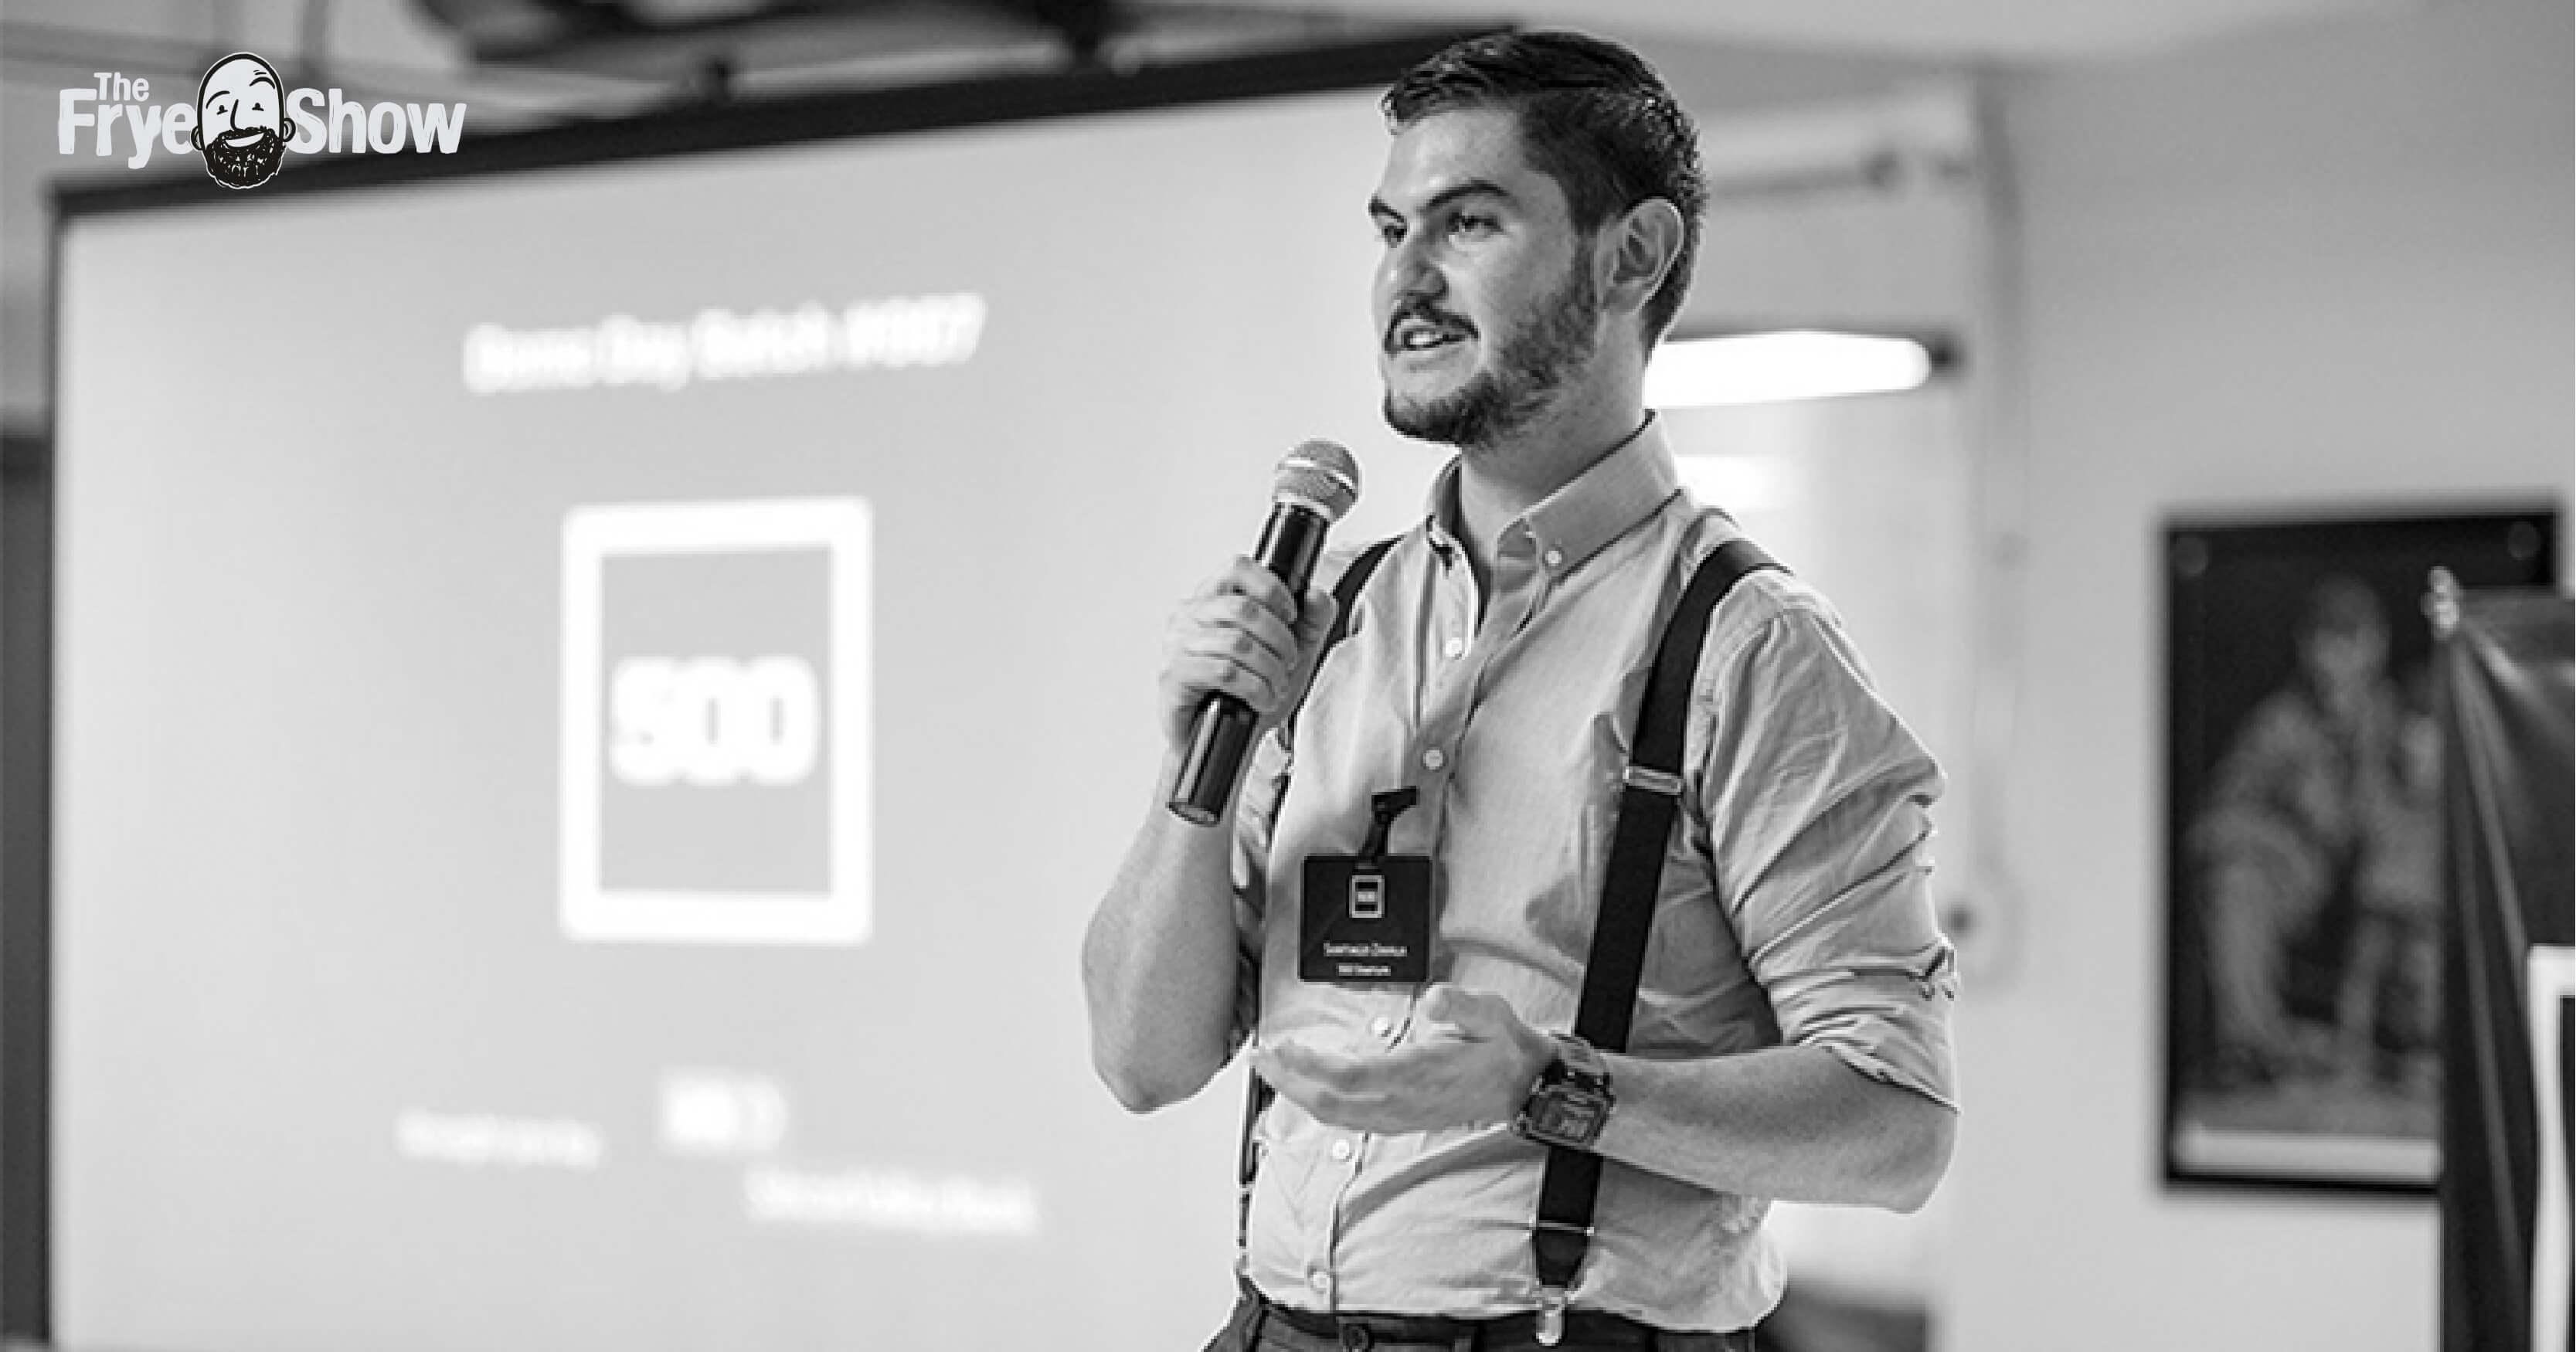 Santiago Zavala podcast sobre 500 Startups